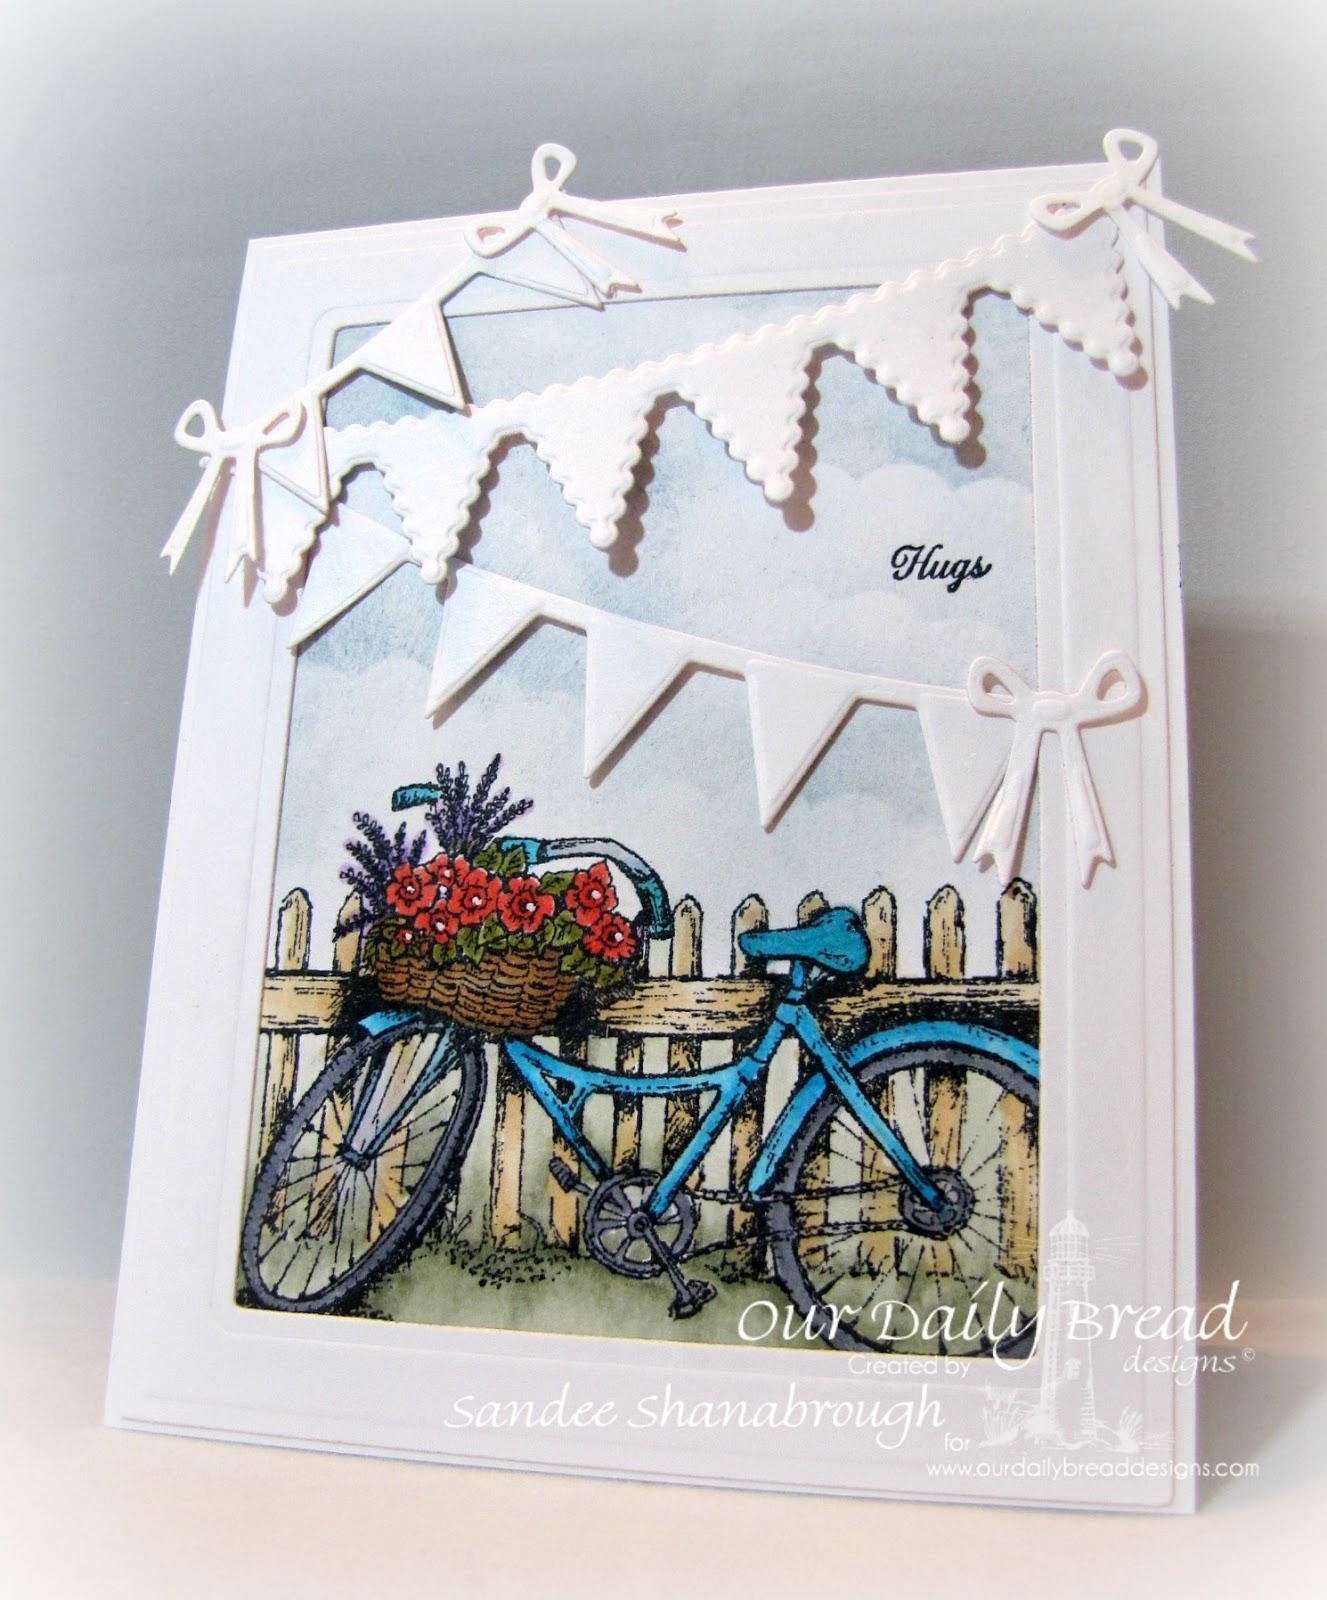 Stamps - Our Daily Bread Designs Bicycle, Ornate Borders Sentiments, ODBD Custom Pennant Row Die,ODBD Custom Pennant Swag Die